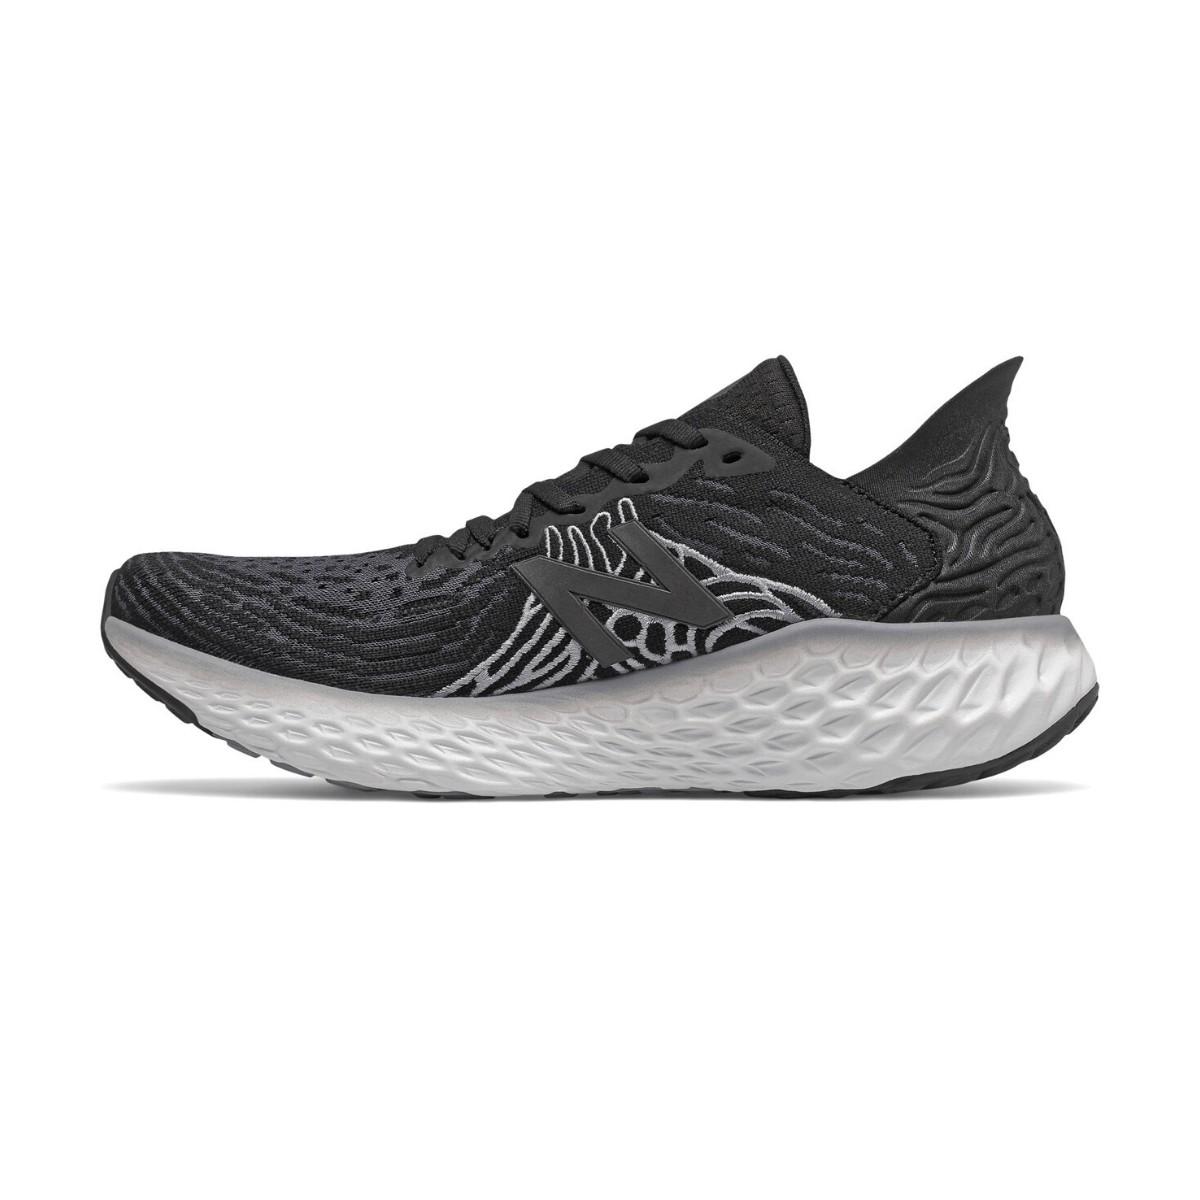 Zapatillas New Balance 1080 v10 Fresh Foam Negro Acero